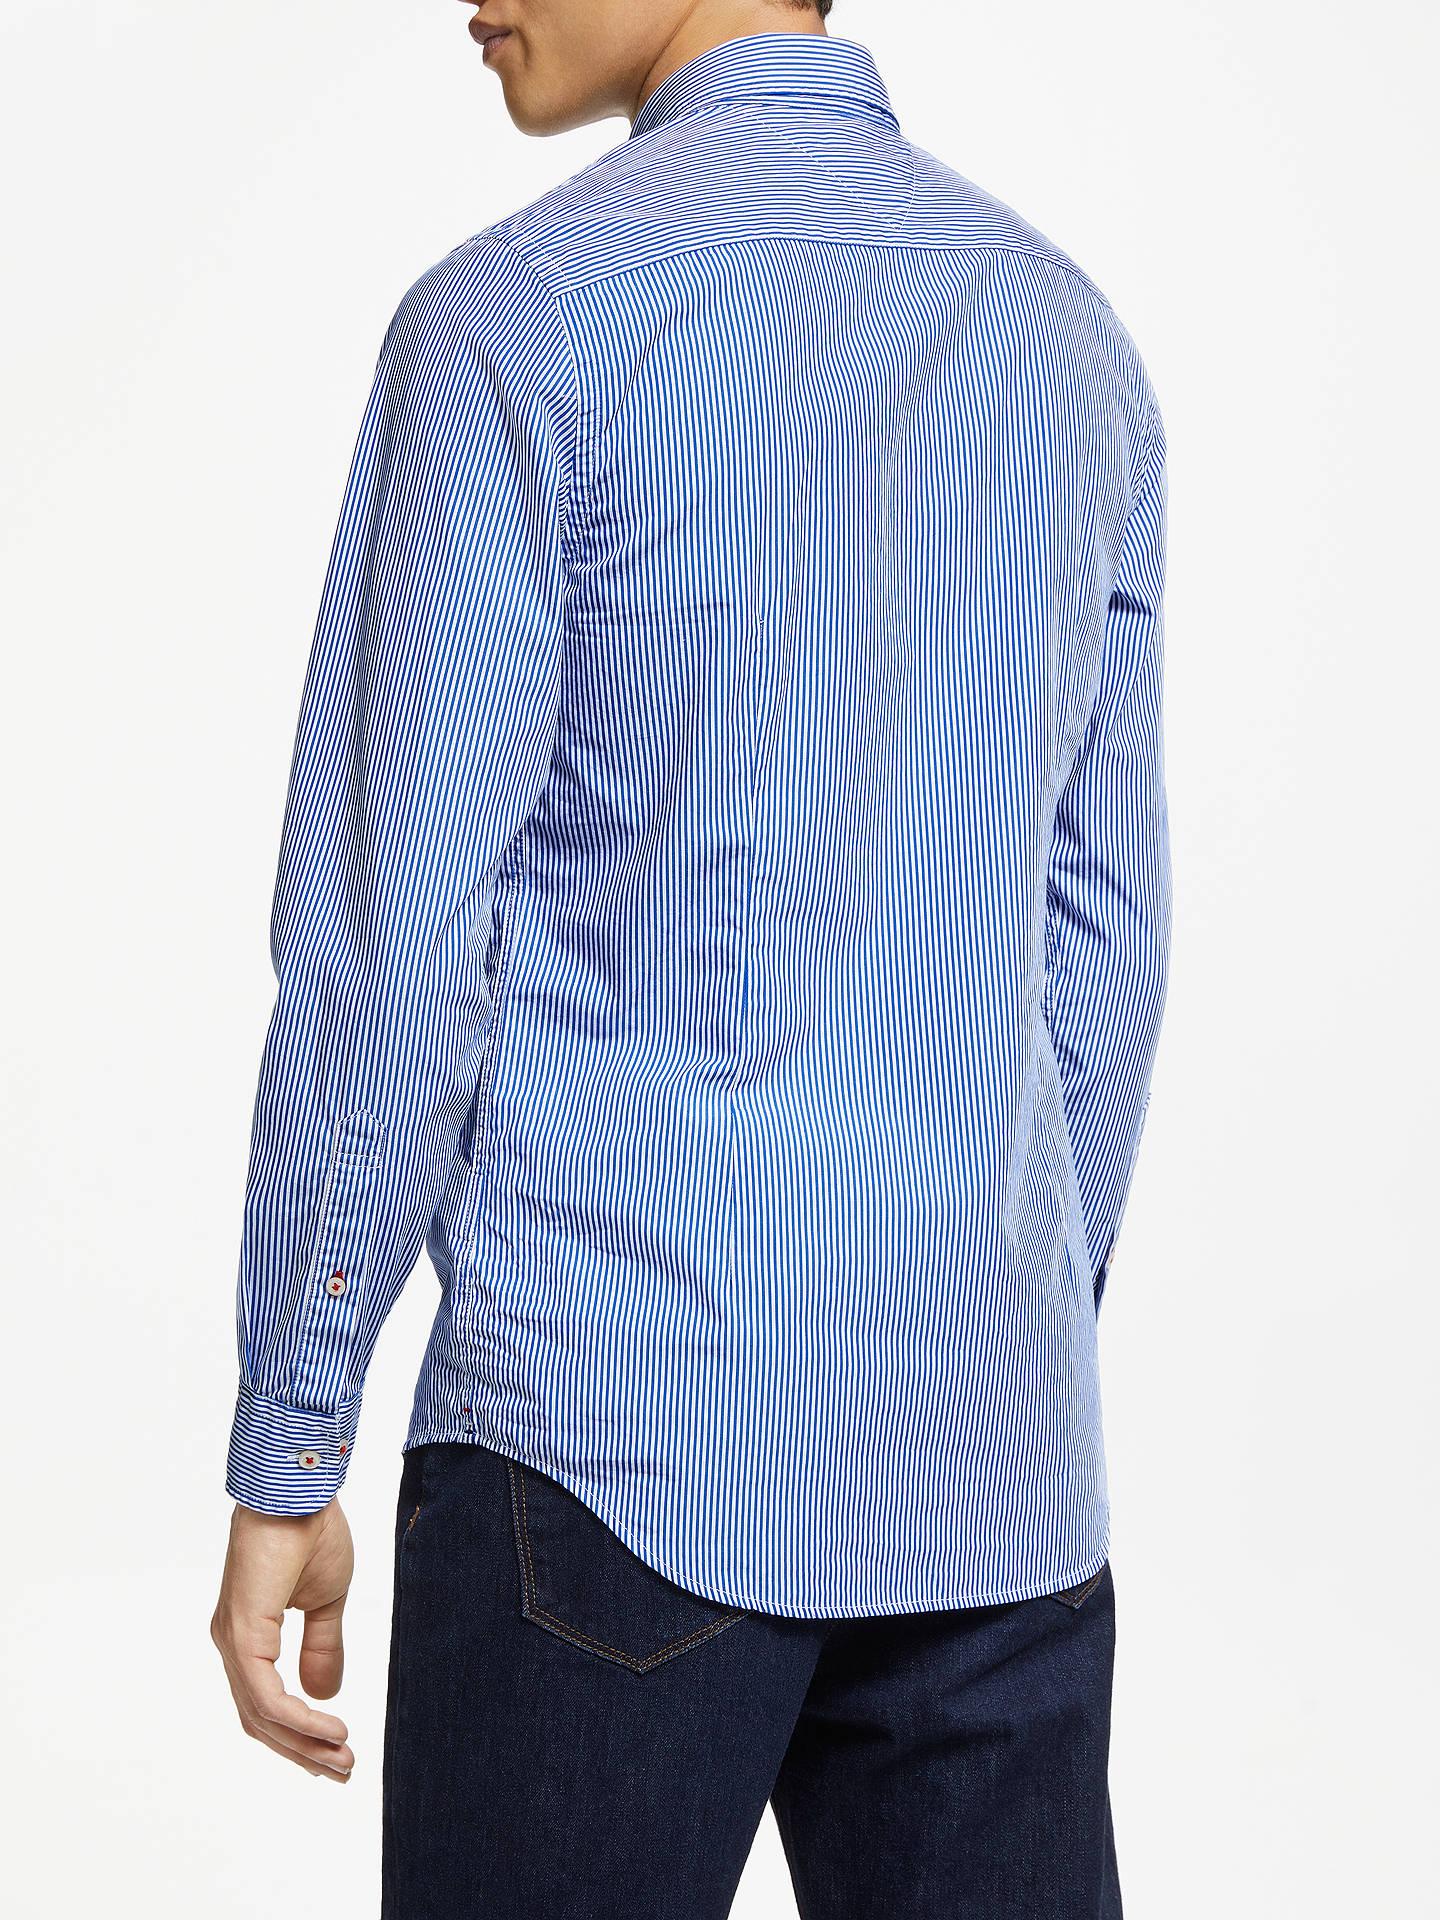 684166a2 ... Buy Tommy Hilfiger Slim Fit Classic Stripe Shirt, Blue Lolite/Bright  White, S ...